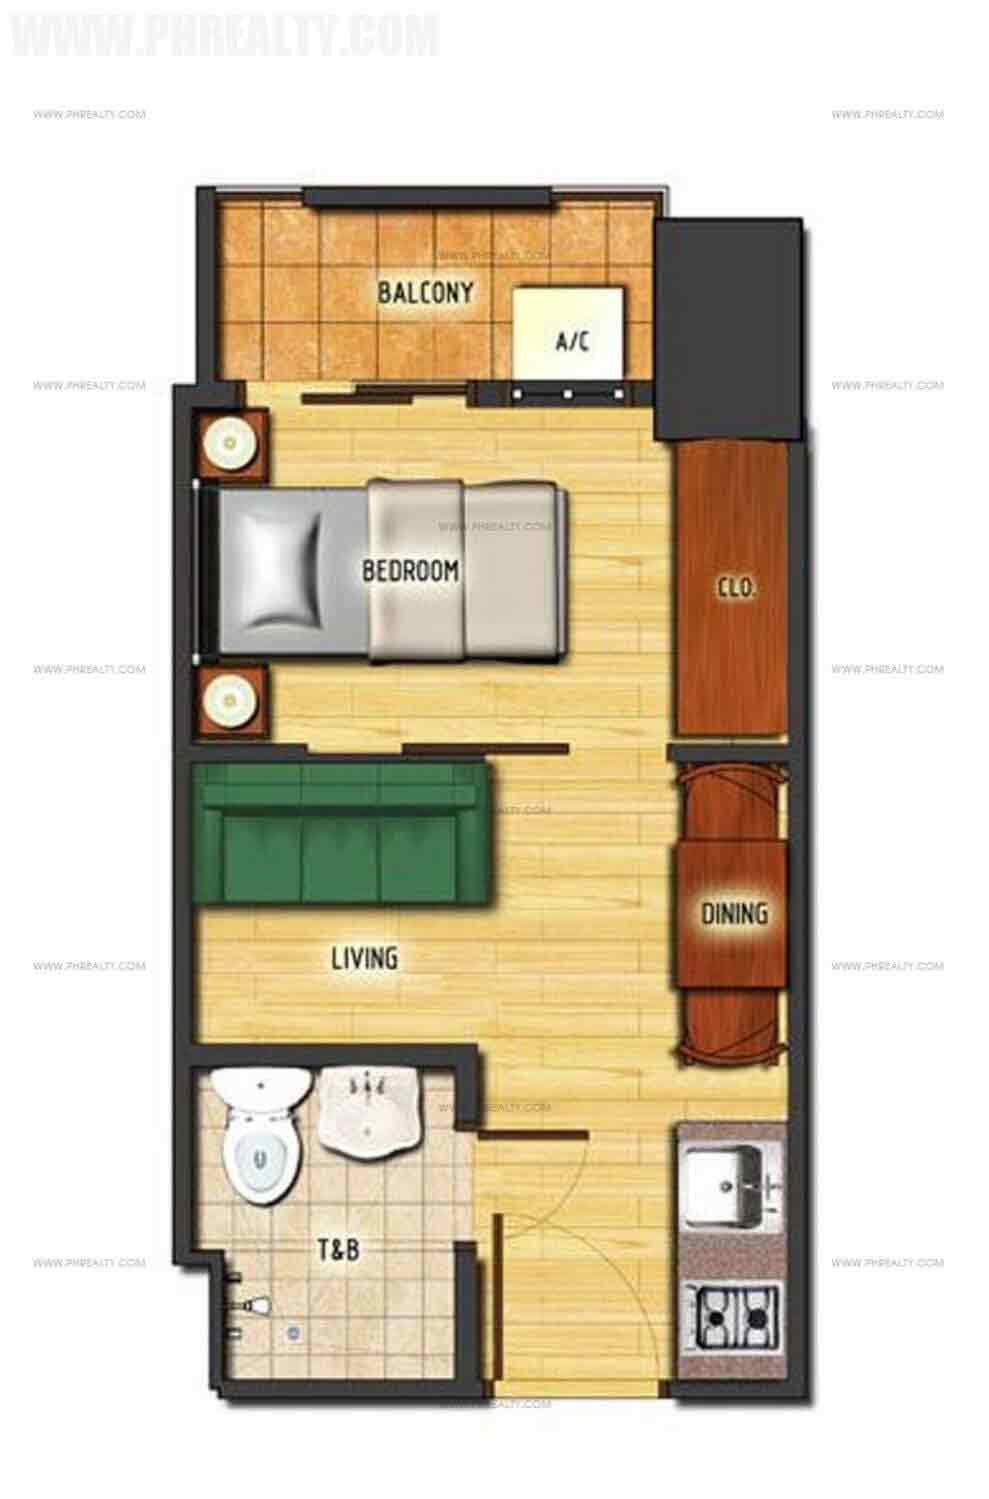 1 Bedroom Cornered Unit Type A